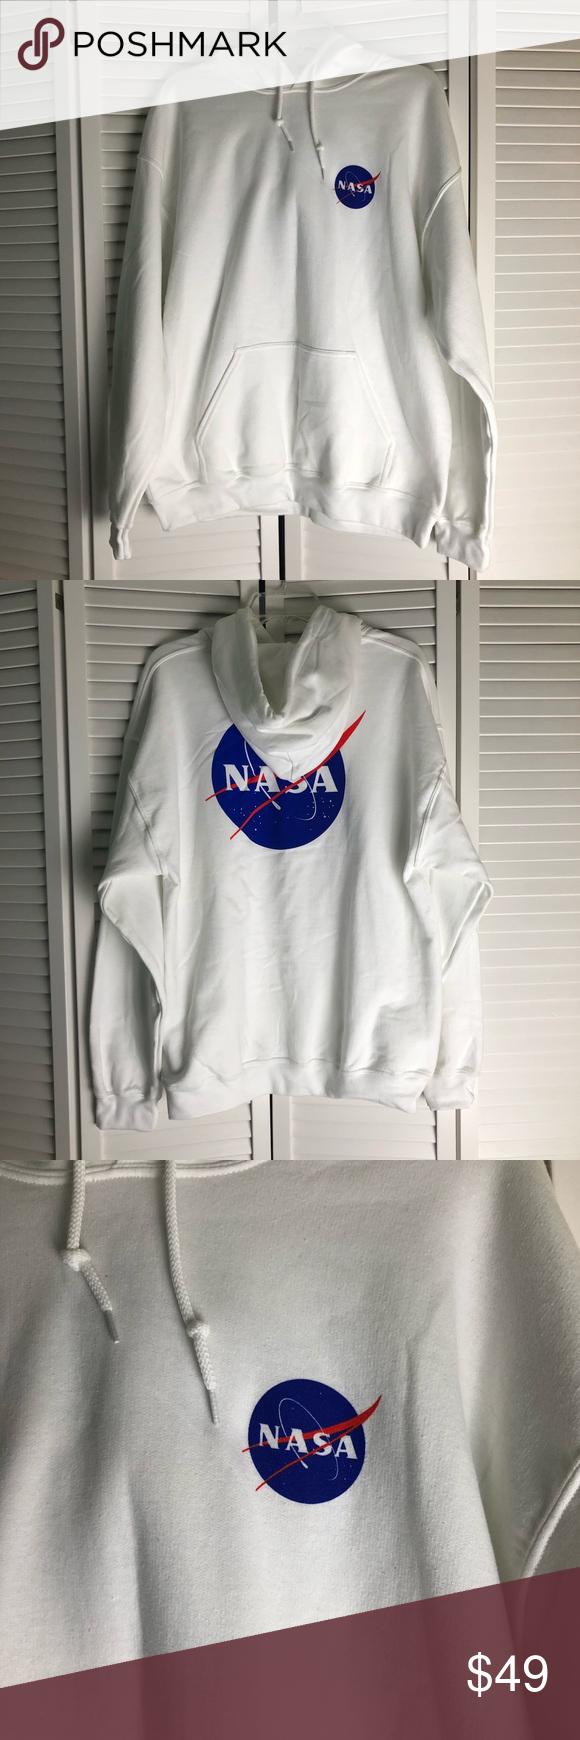 New Nasa Oversized White Hoodie Sweatshirt L White Sweatshirt Hoodie Oversized White Hoodie Nasa Clothes [ 1740 x 580 Pixel ]